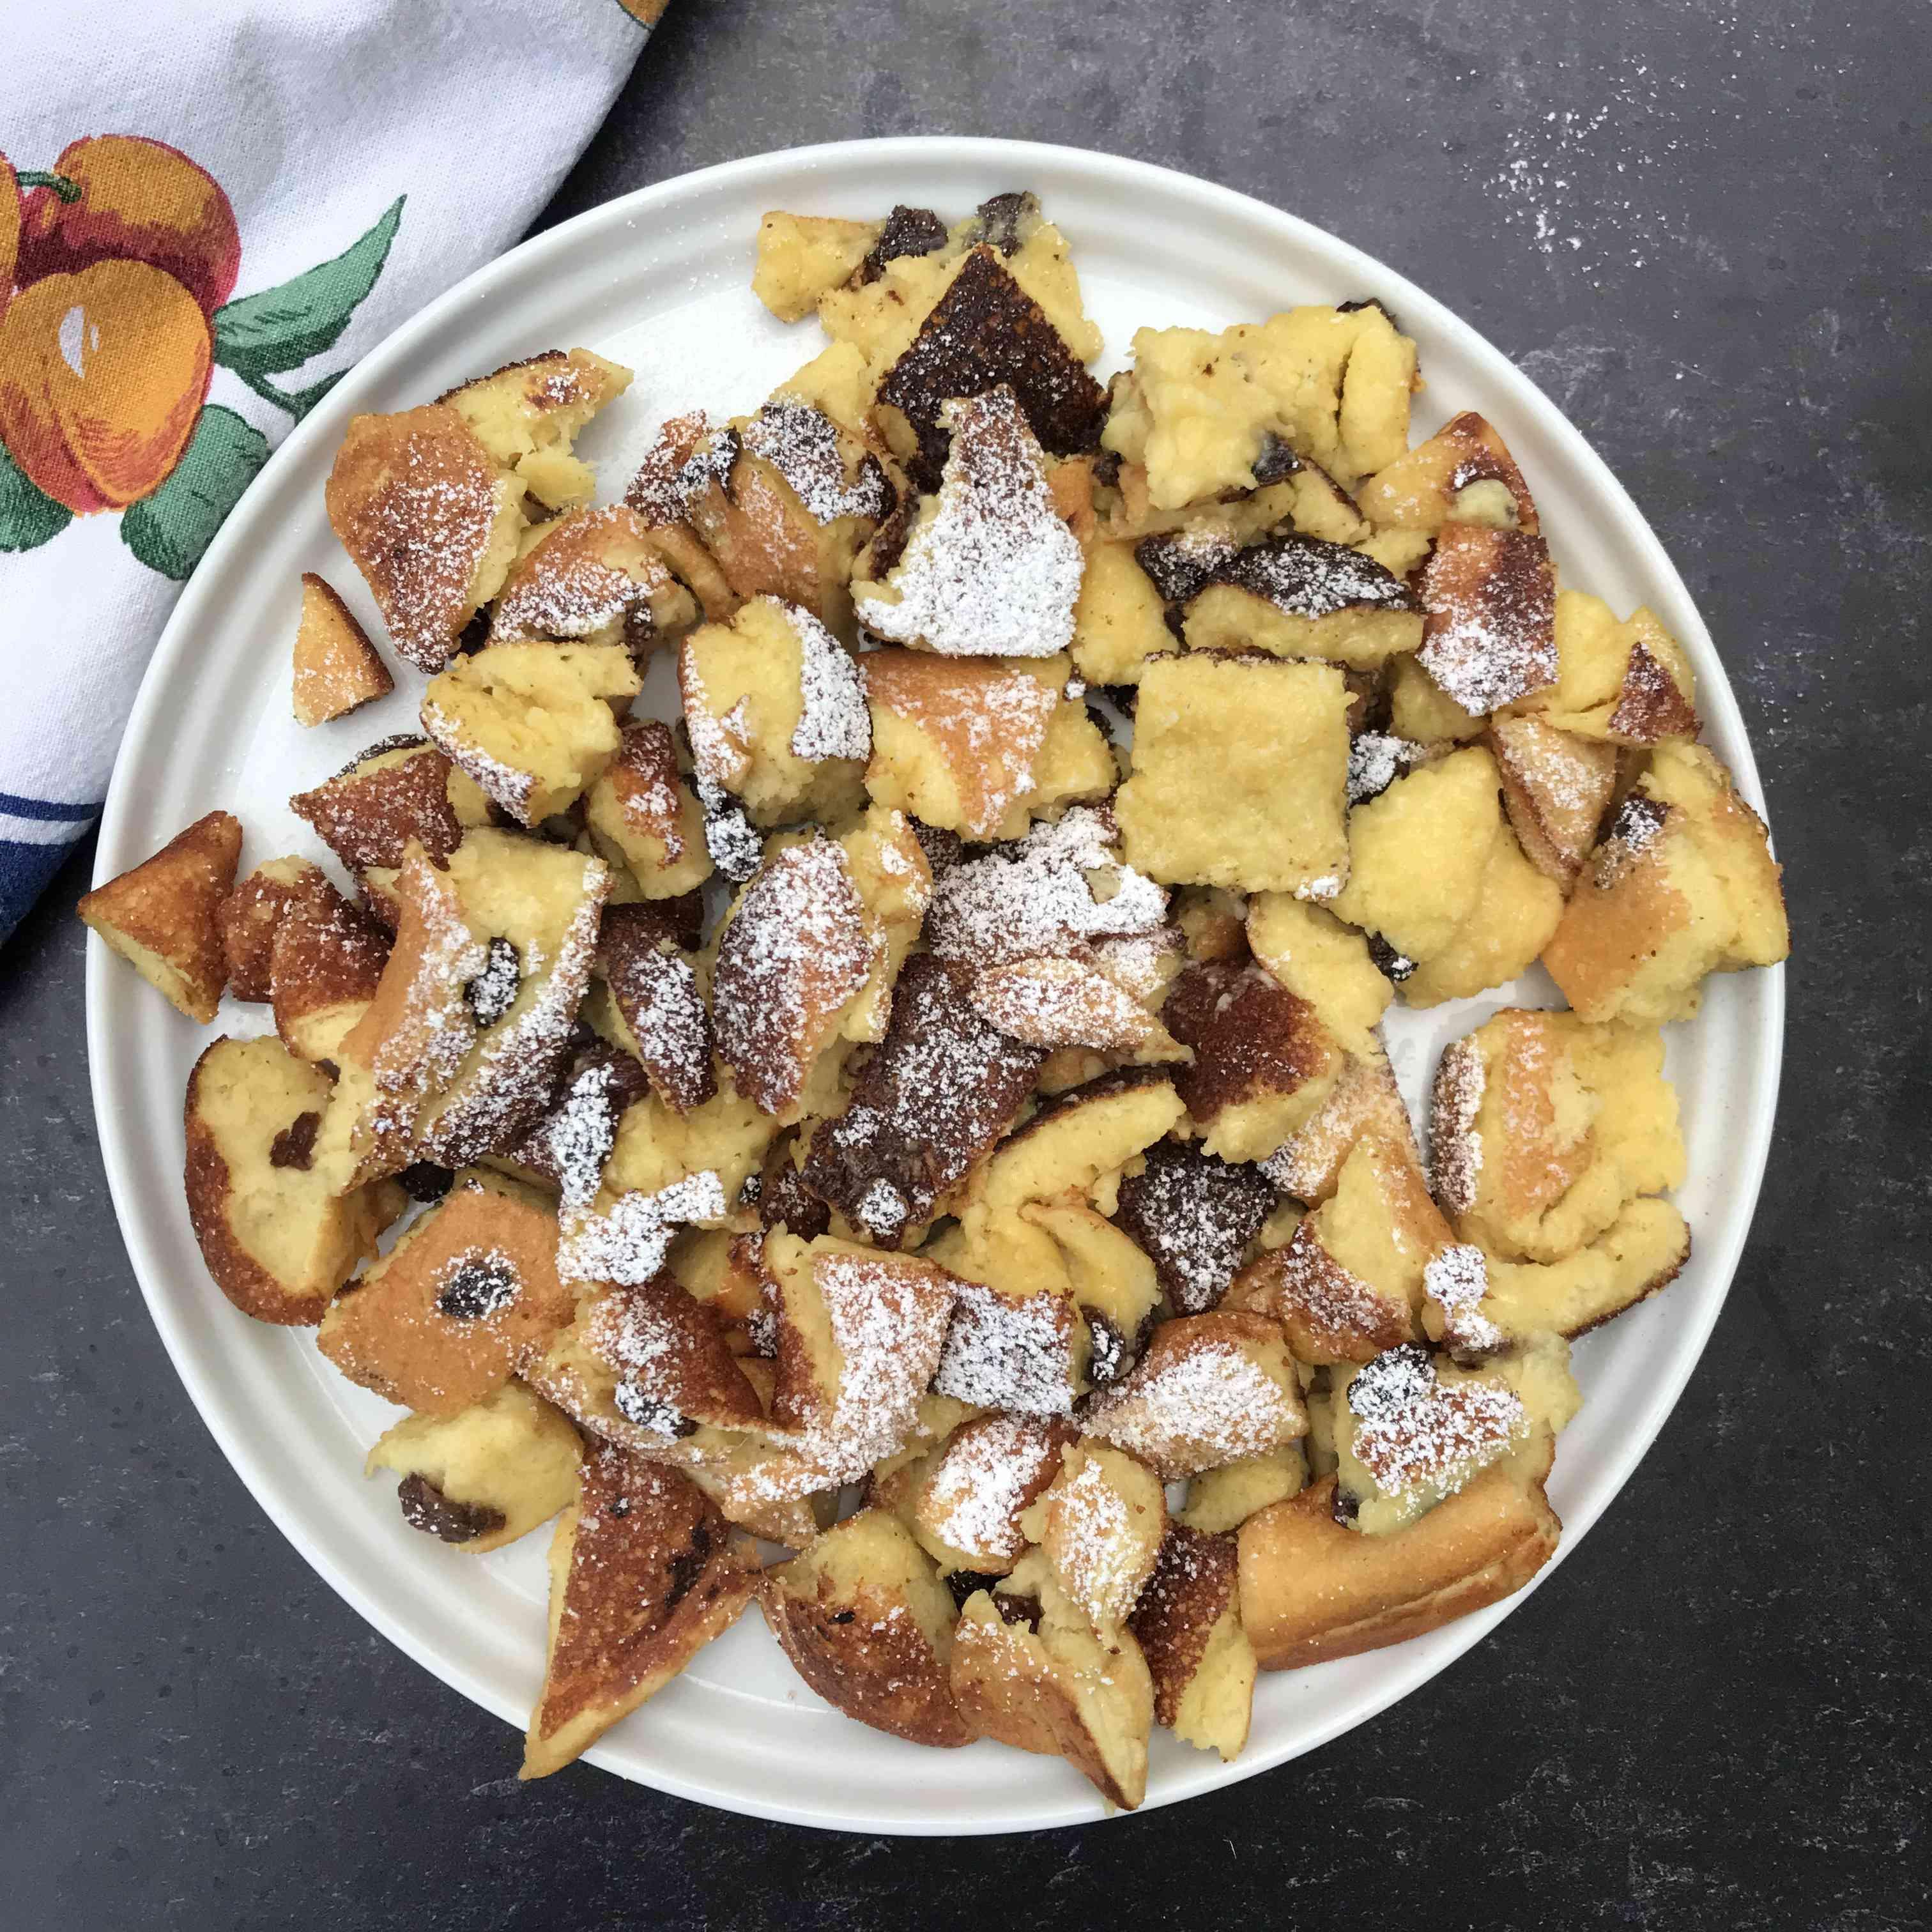 Austrian Pancakes With Raisins (Kaiserschmarrn) Tester Image